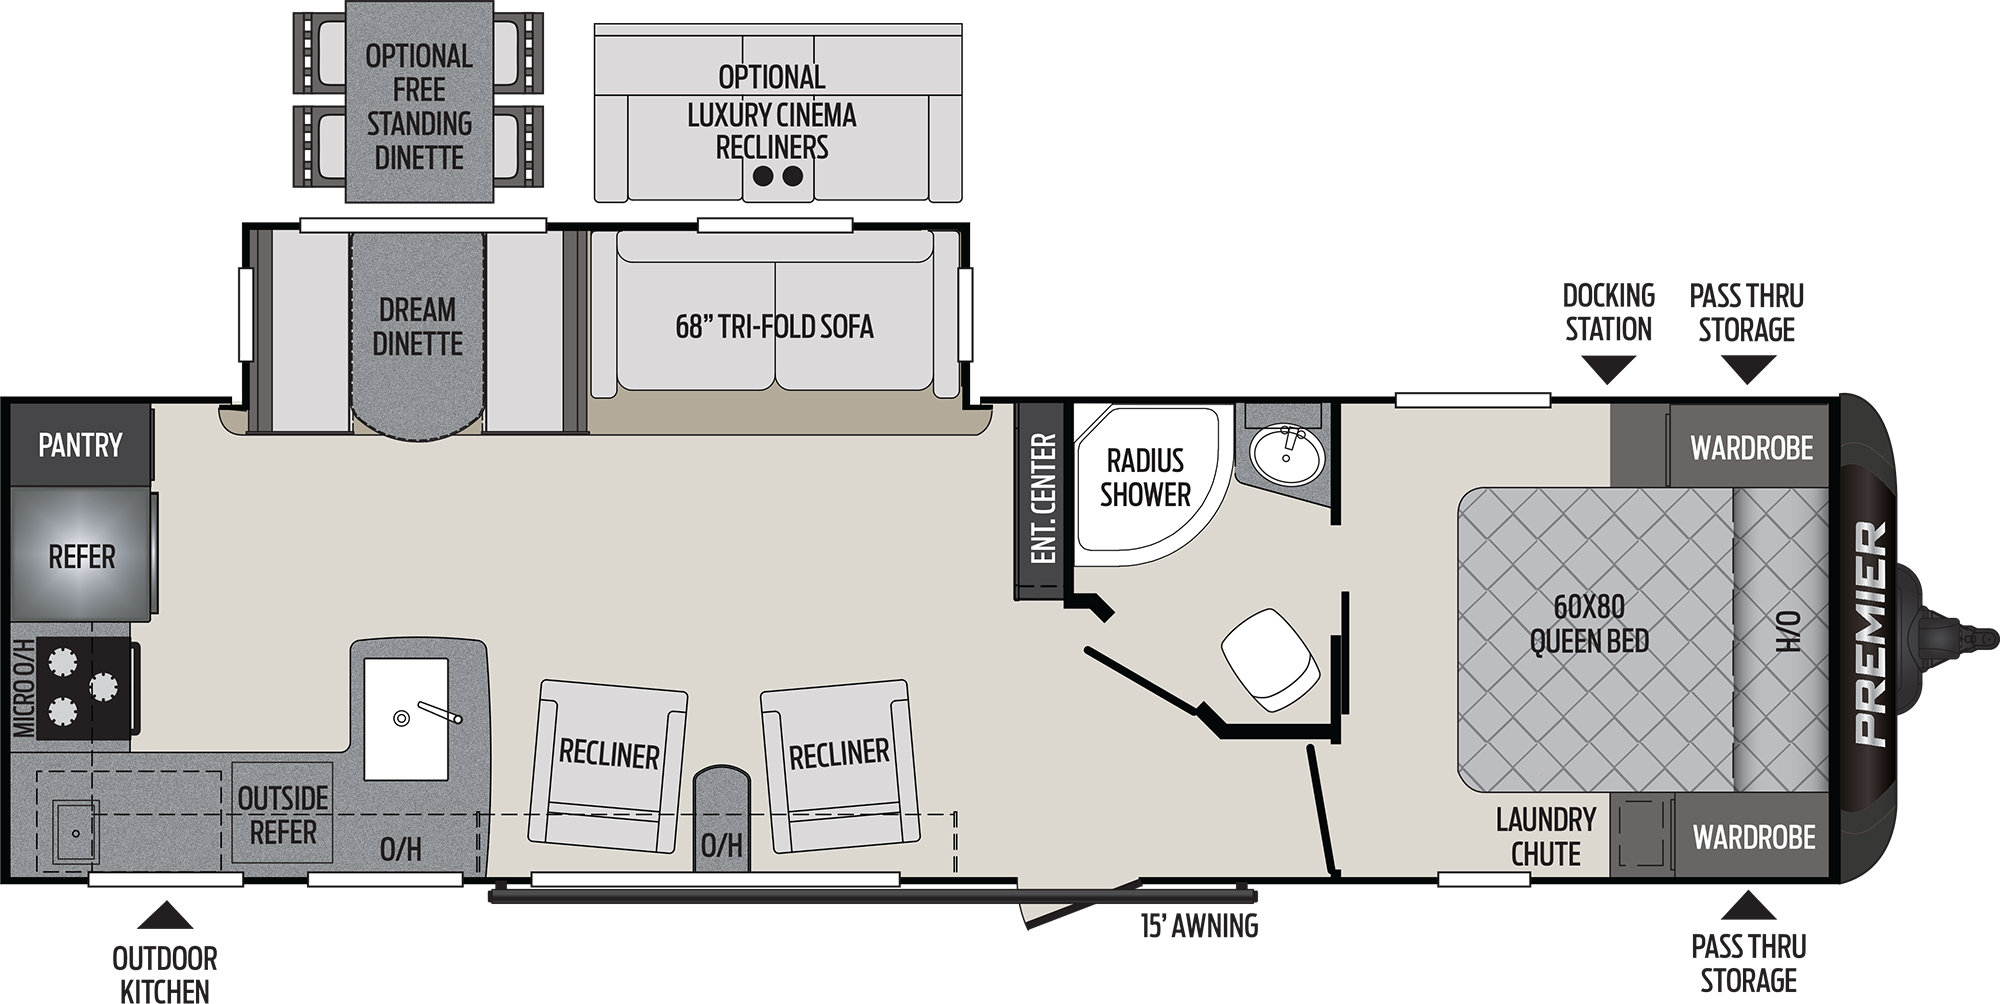 2020 KEYSTONE PREMIER 29RKPR (couples) Floorplan